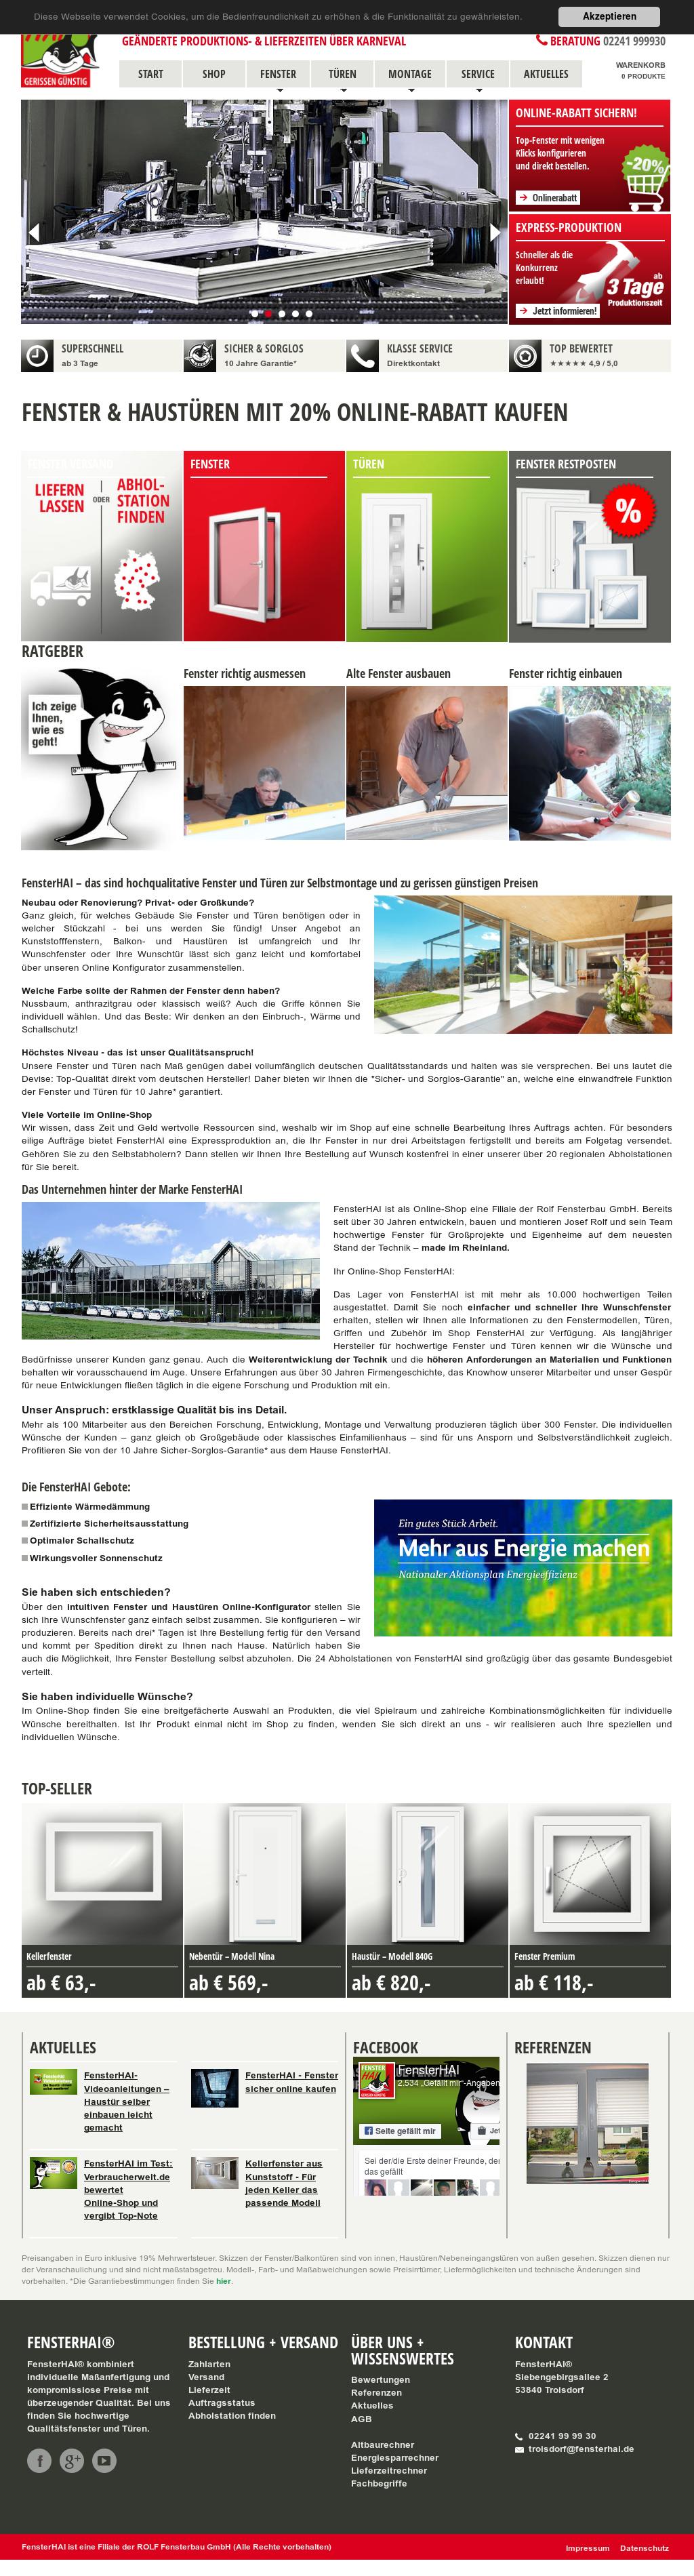 fensterhai competitors, revenue and employees - owler company profile